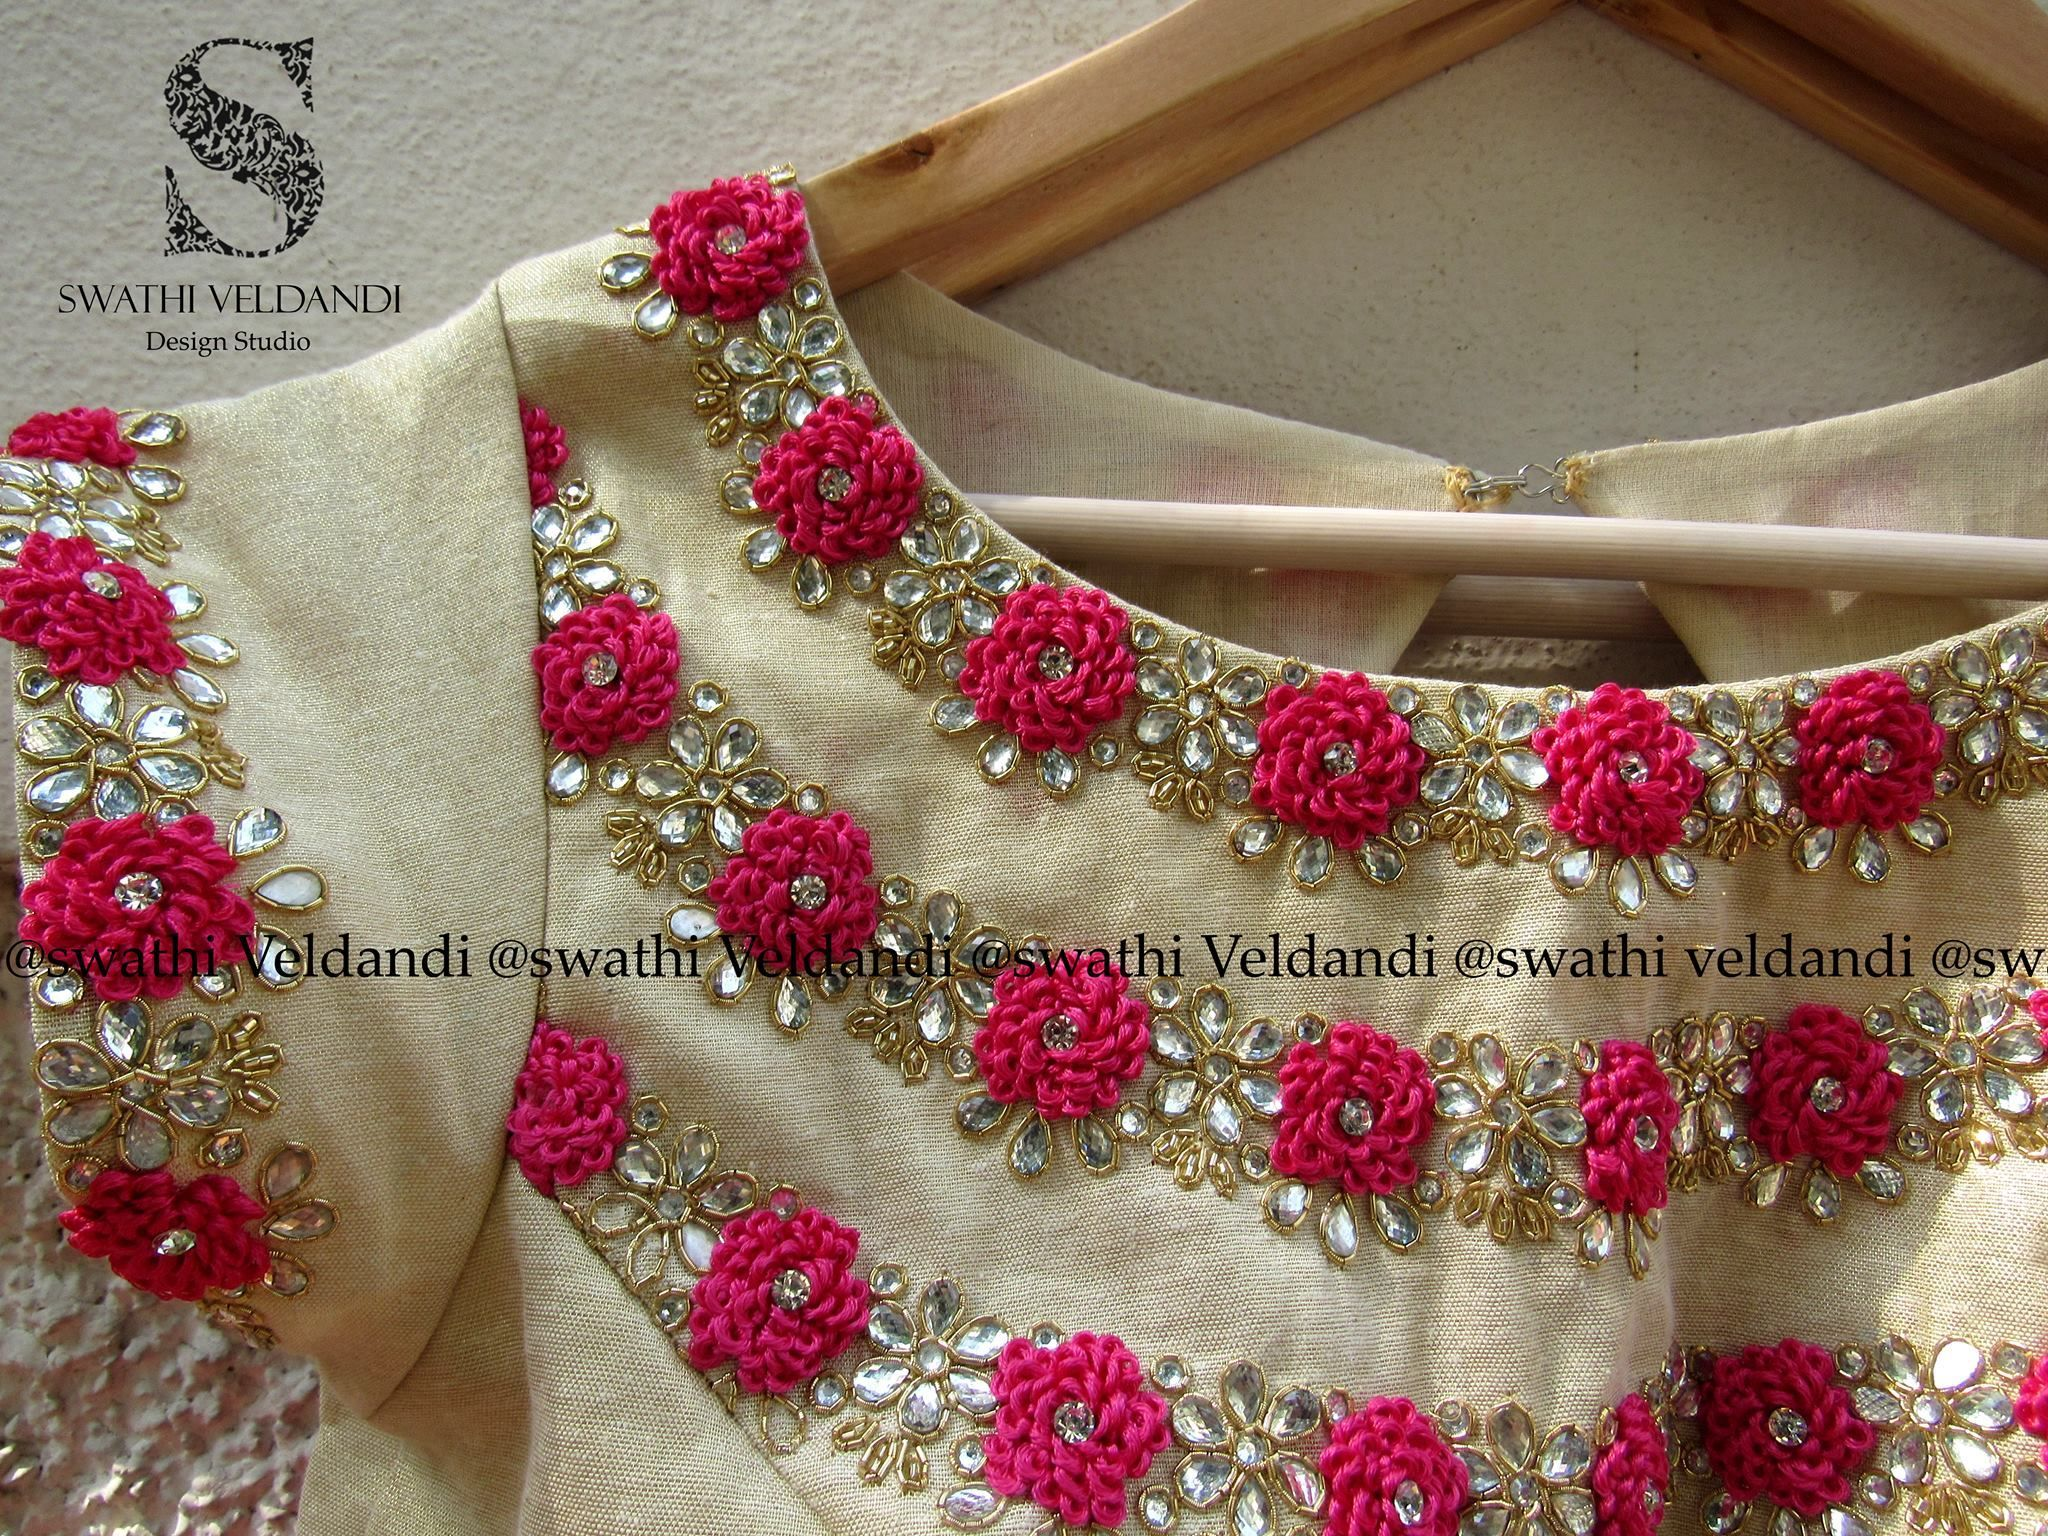 b817587545507 Beautiful boat neck designer blouse with hand embroidery thread and kundan  work from Swathi Veldandi.